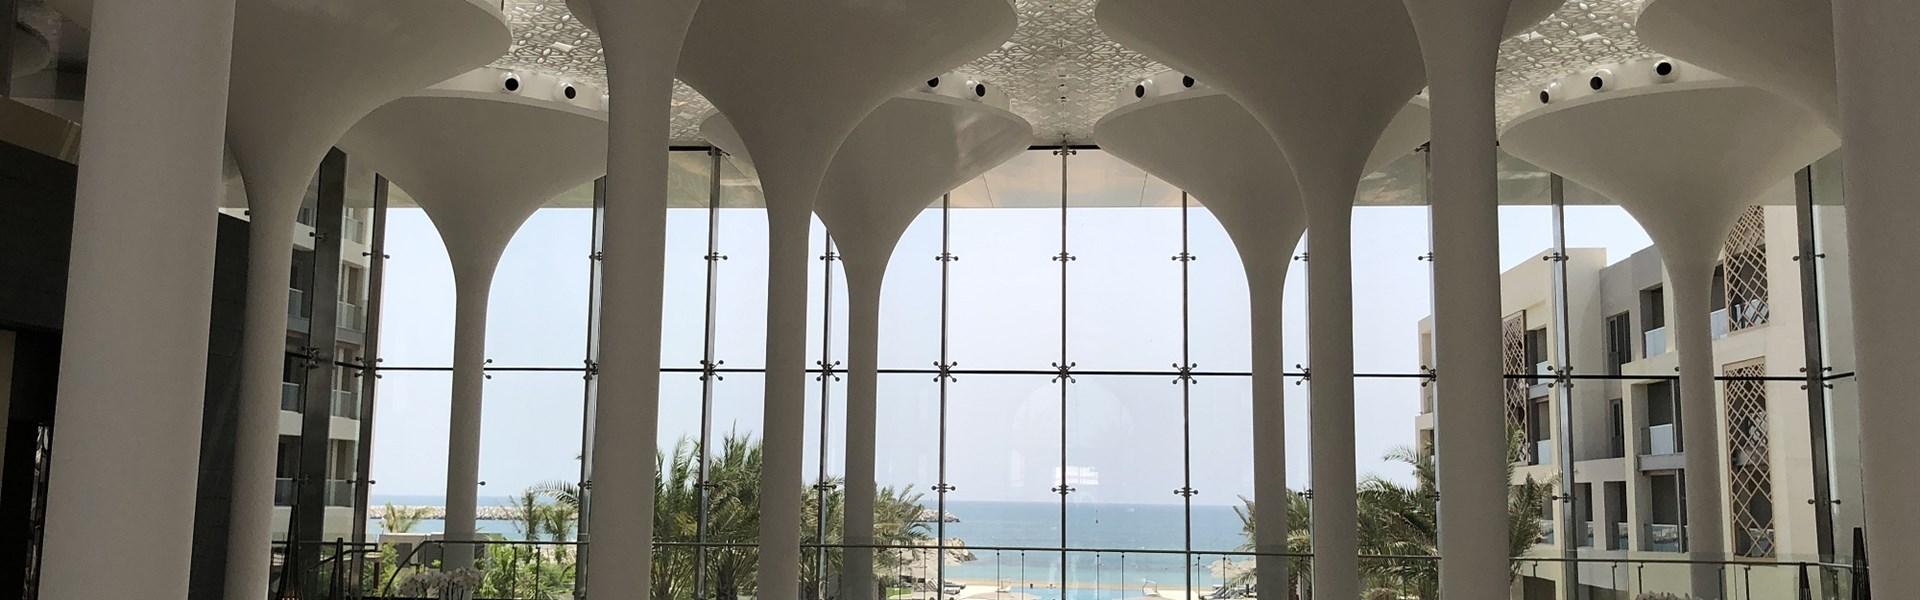 Marco Polo - Kempinski hotel Muscat -